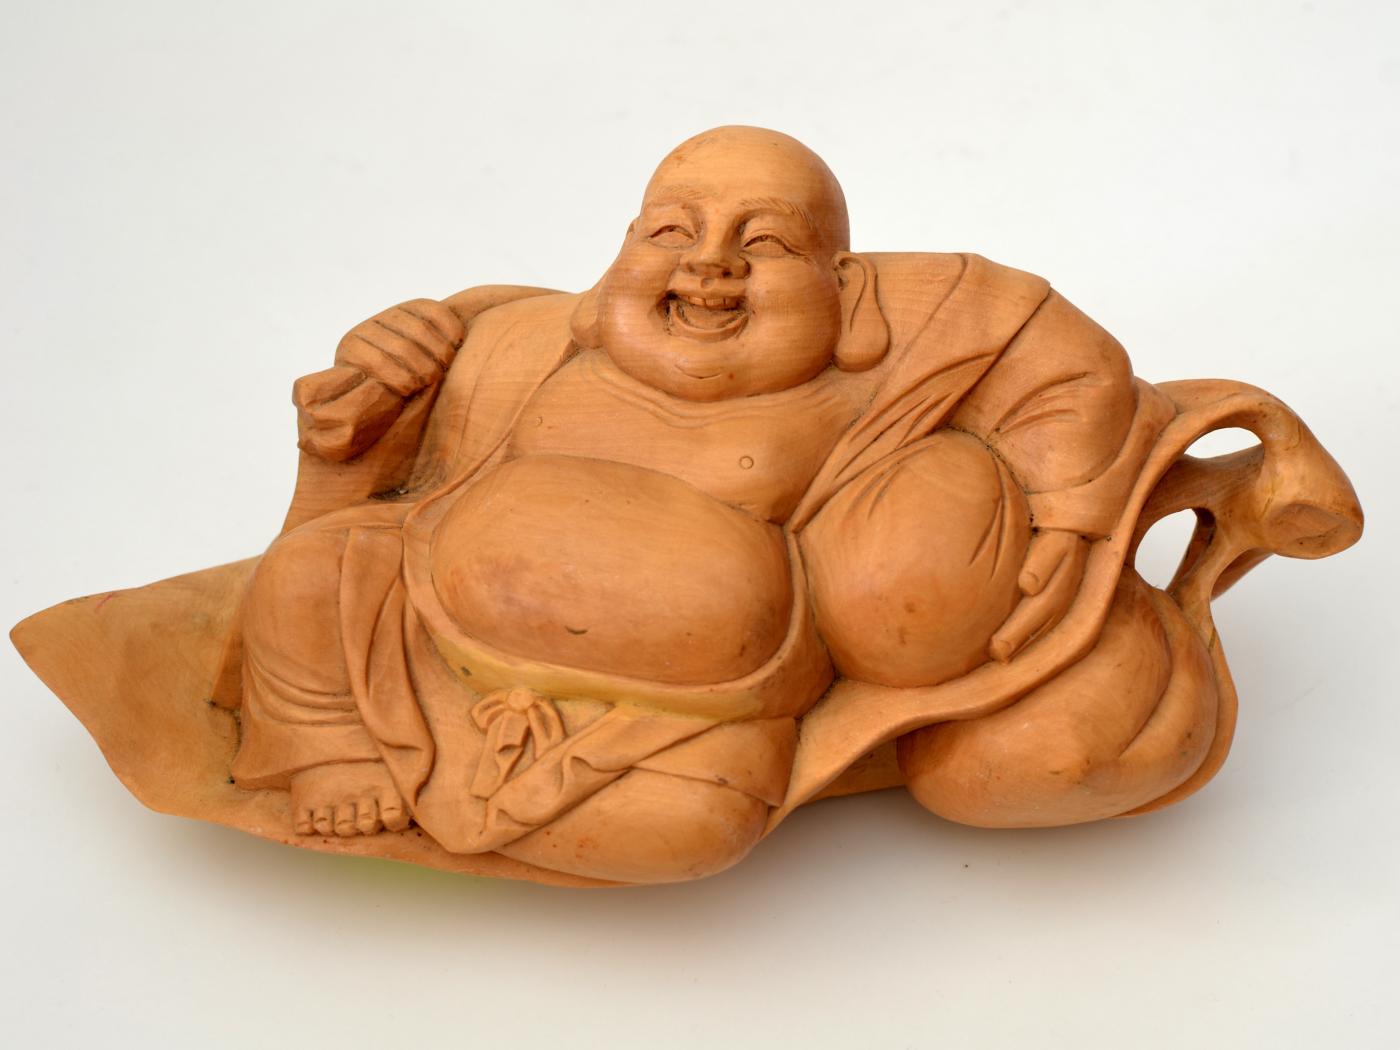 Statueta din lemn Buddha sezand